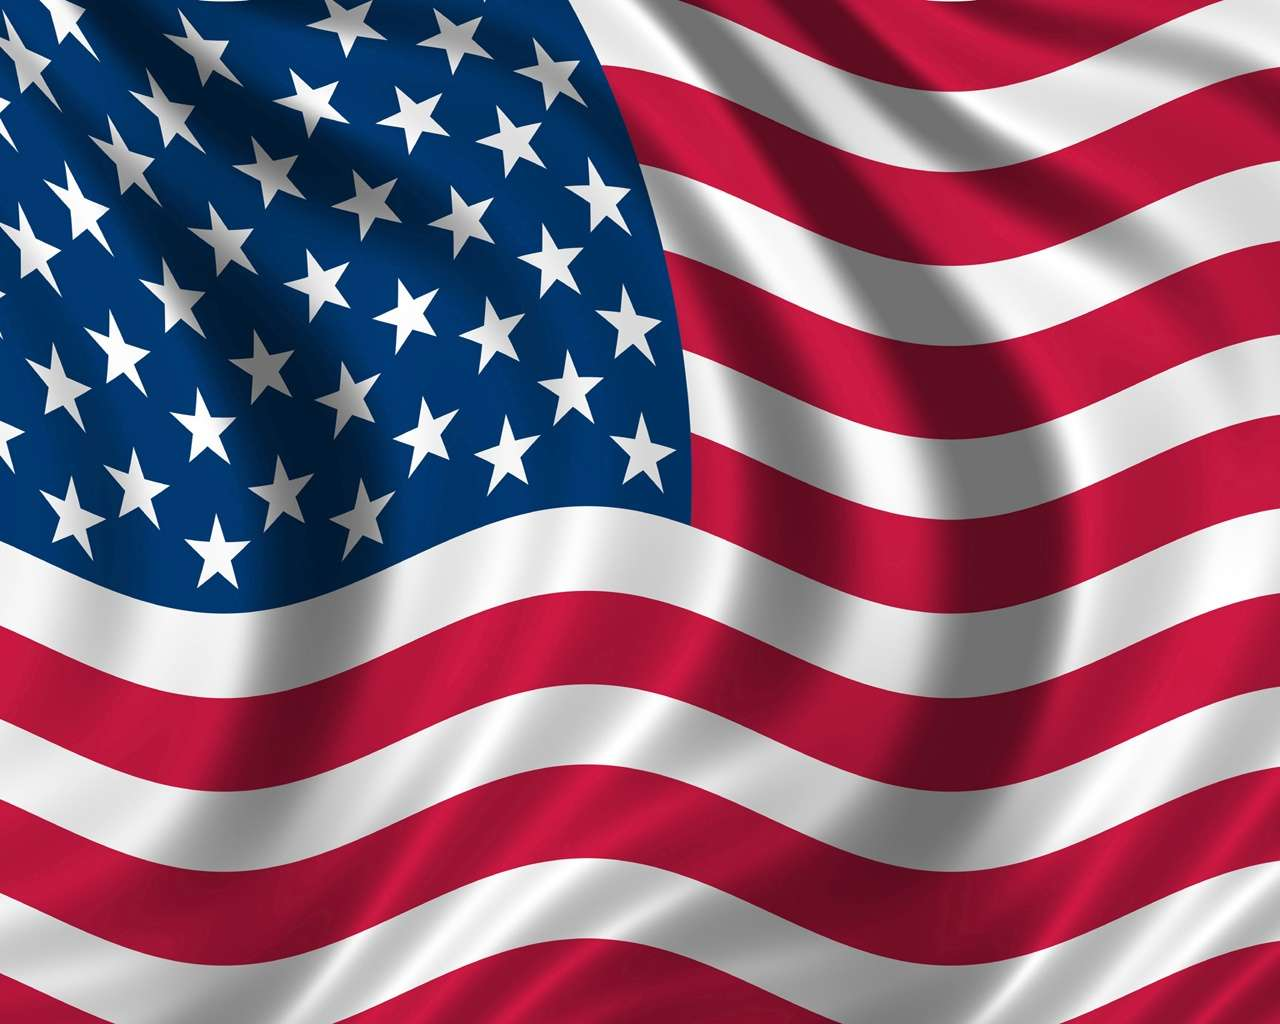 American Flag Wallpaper 034